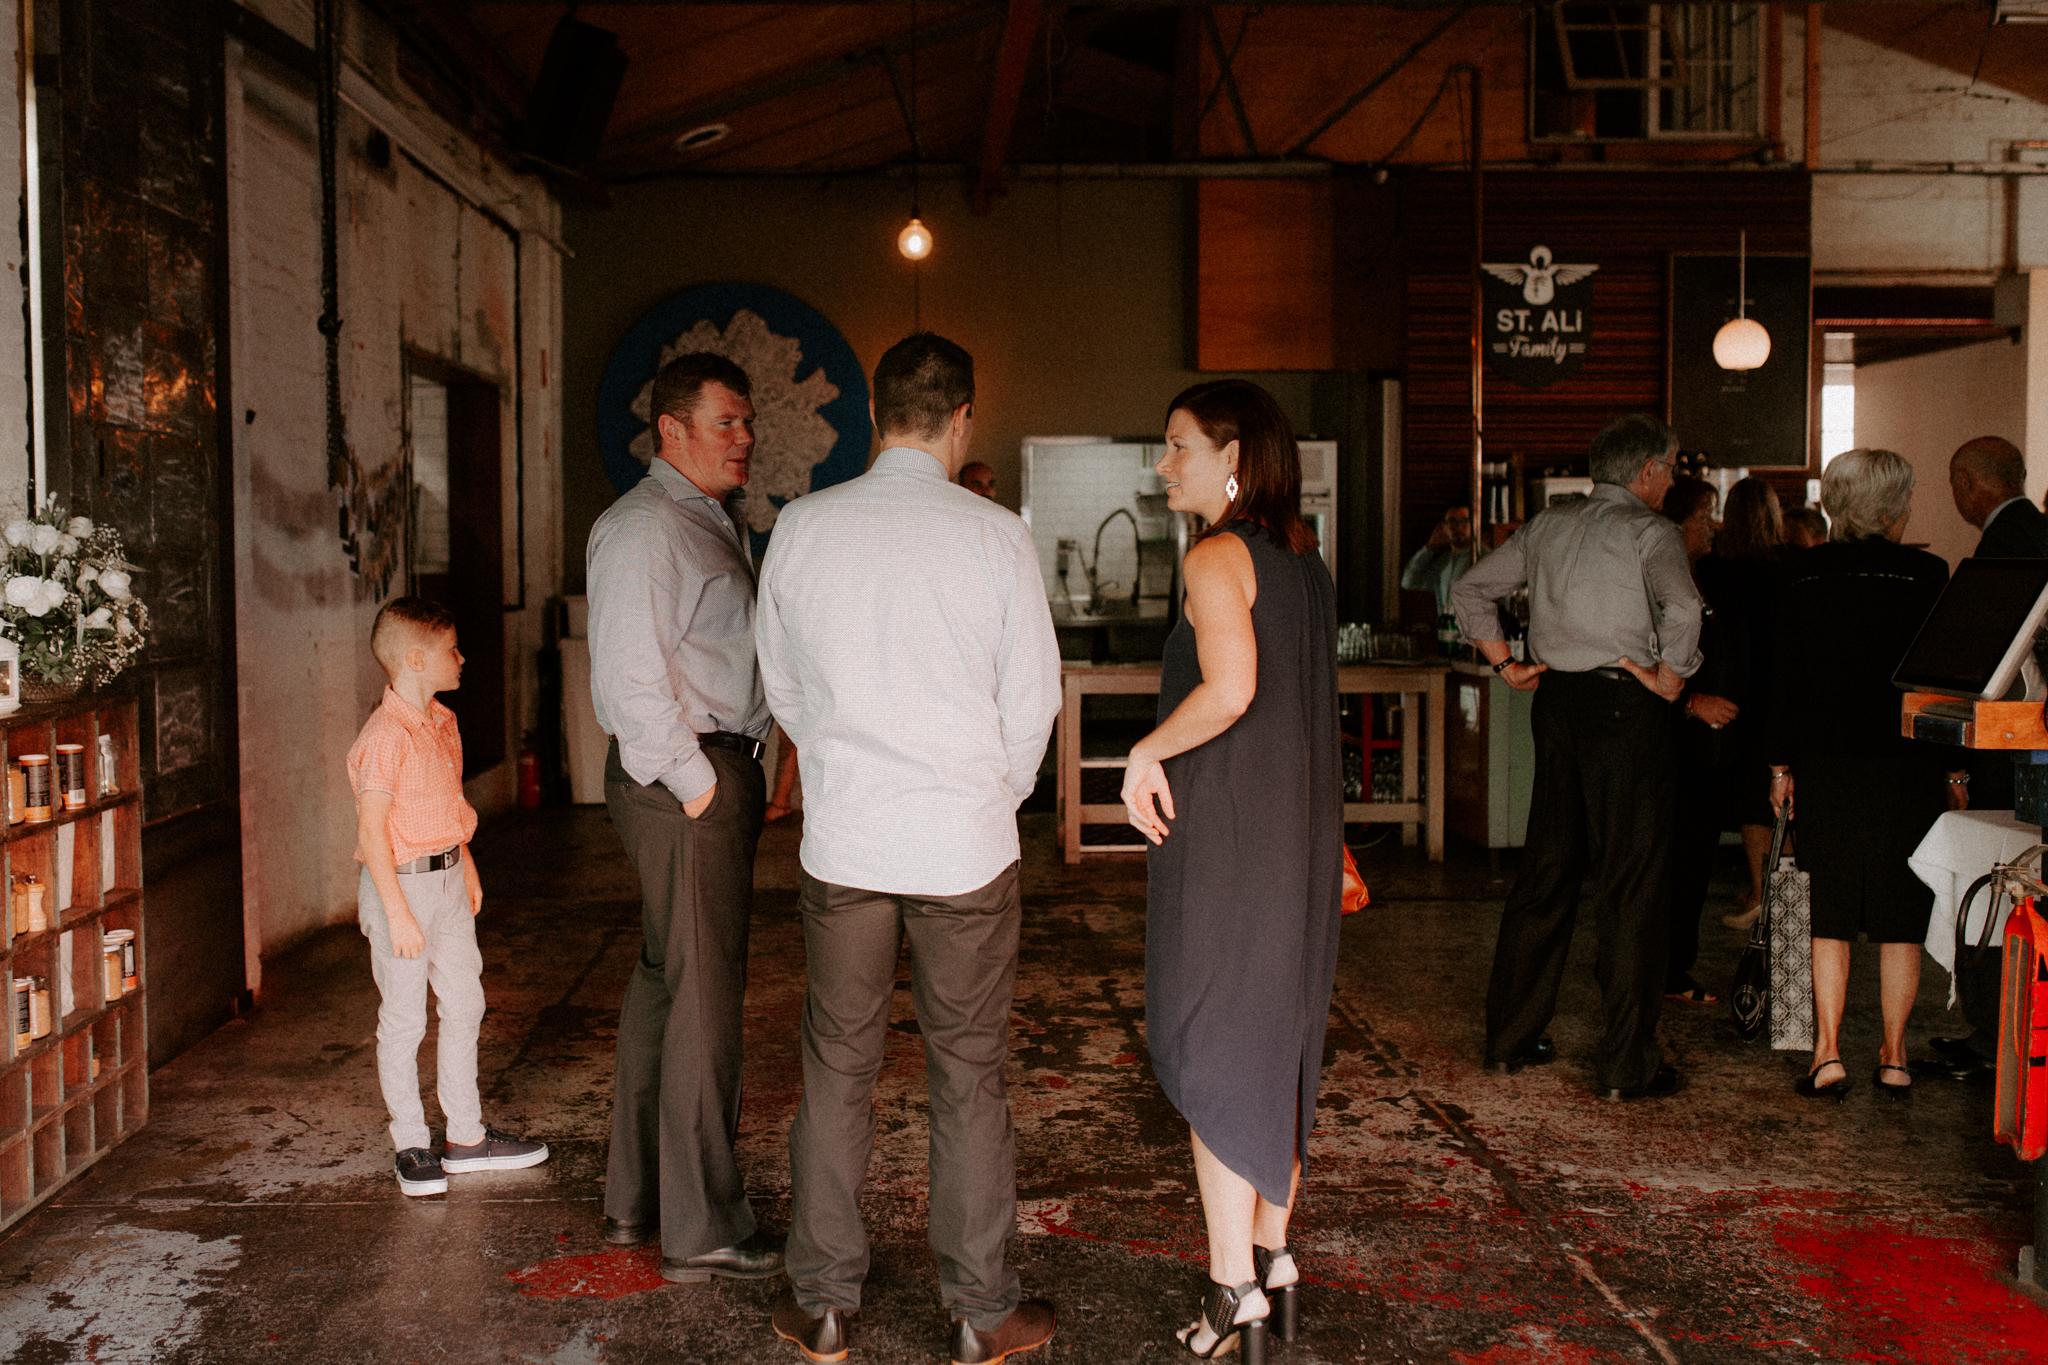 St-Ali-Wedding-Emotions-and-Math-Photography-009.jpg